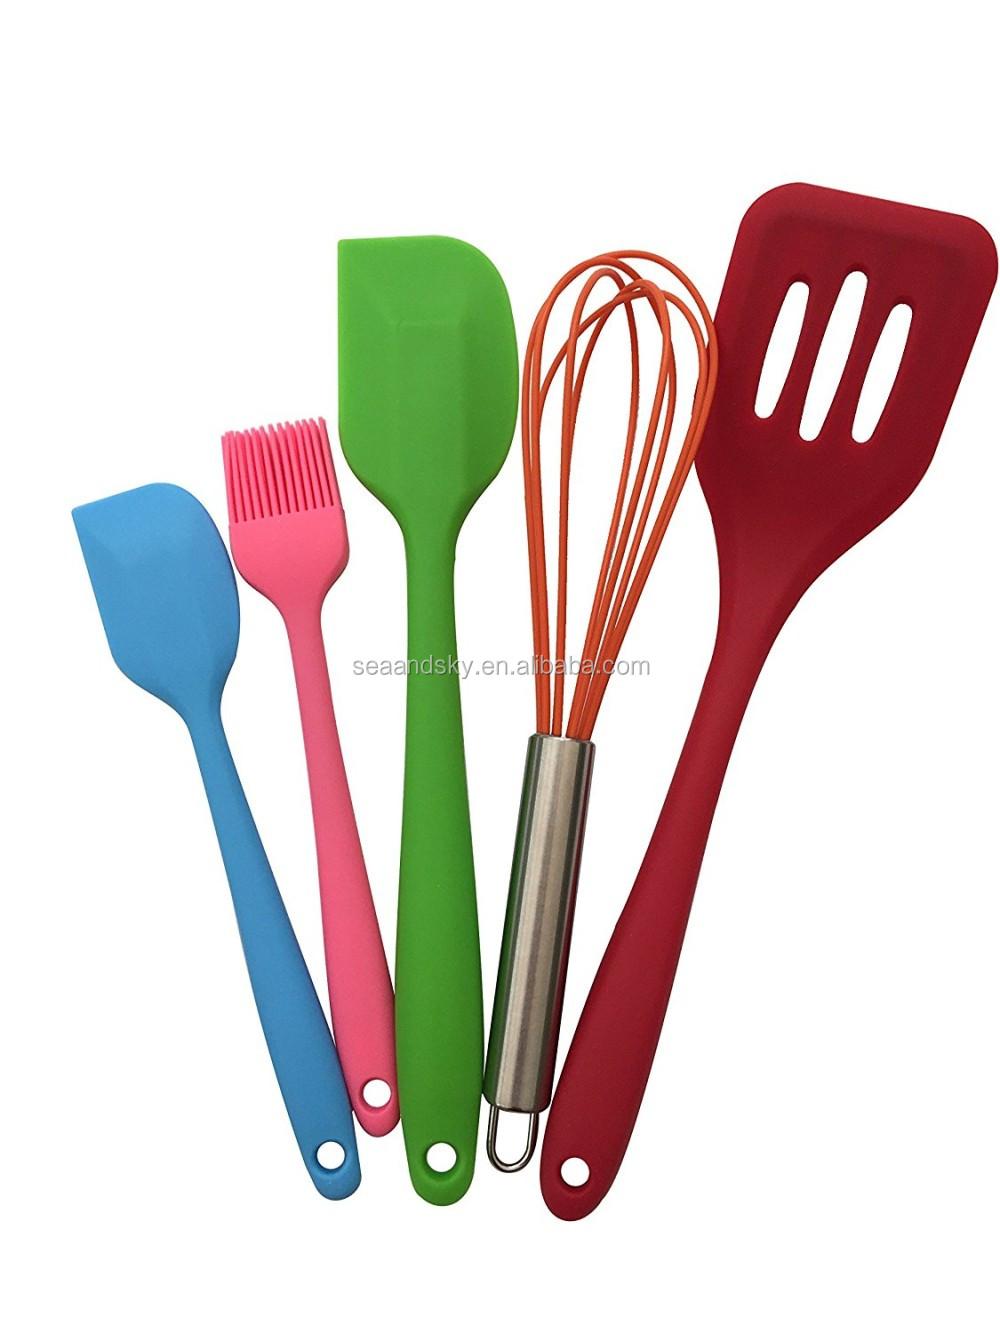 Bamb pl stico de acero inoxidable utensilios de cocina de silicona 5 unidades premium - Utensilios de cocina de silicona ...